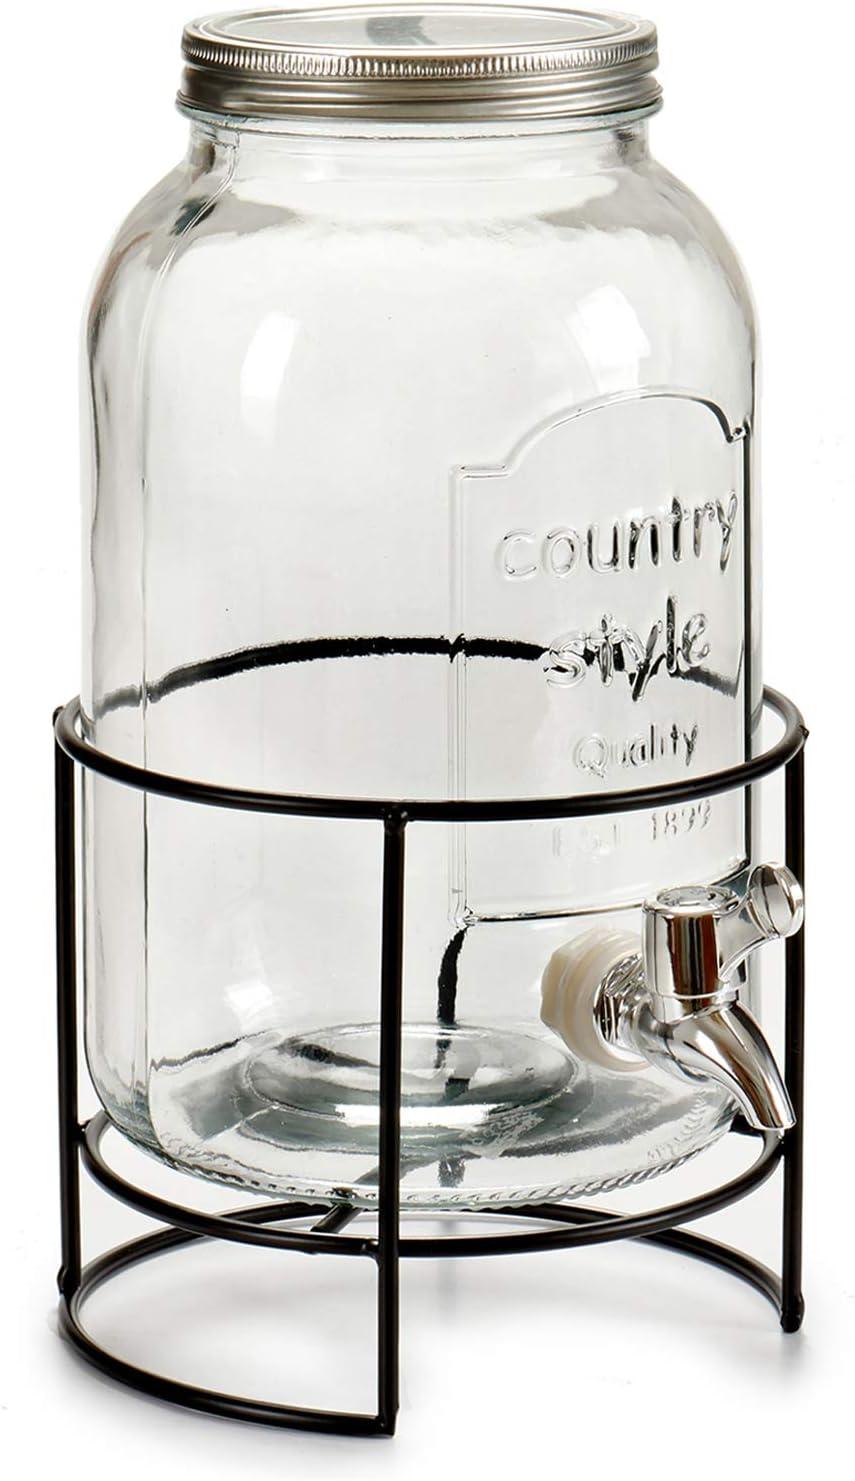 TU TENDENCIA ÚNICA Tarro con Grifo Dispensador de Cristal de 3,5L. Tapa de Metal. Base de Metal Negro Resistente. Medidas: 22x17x30 cm